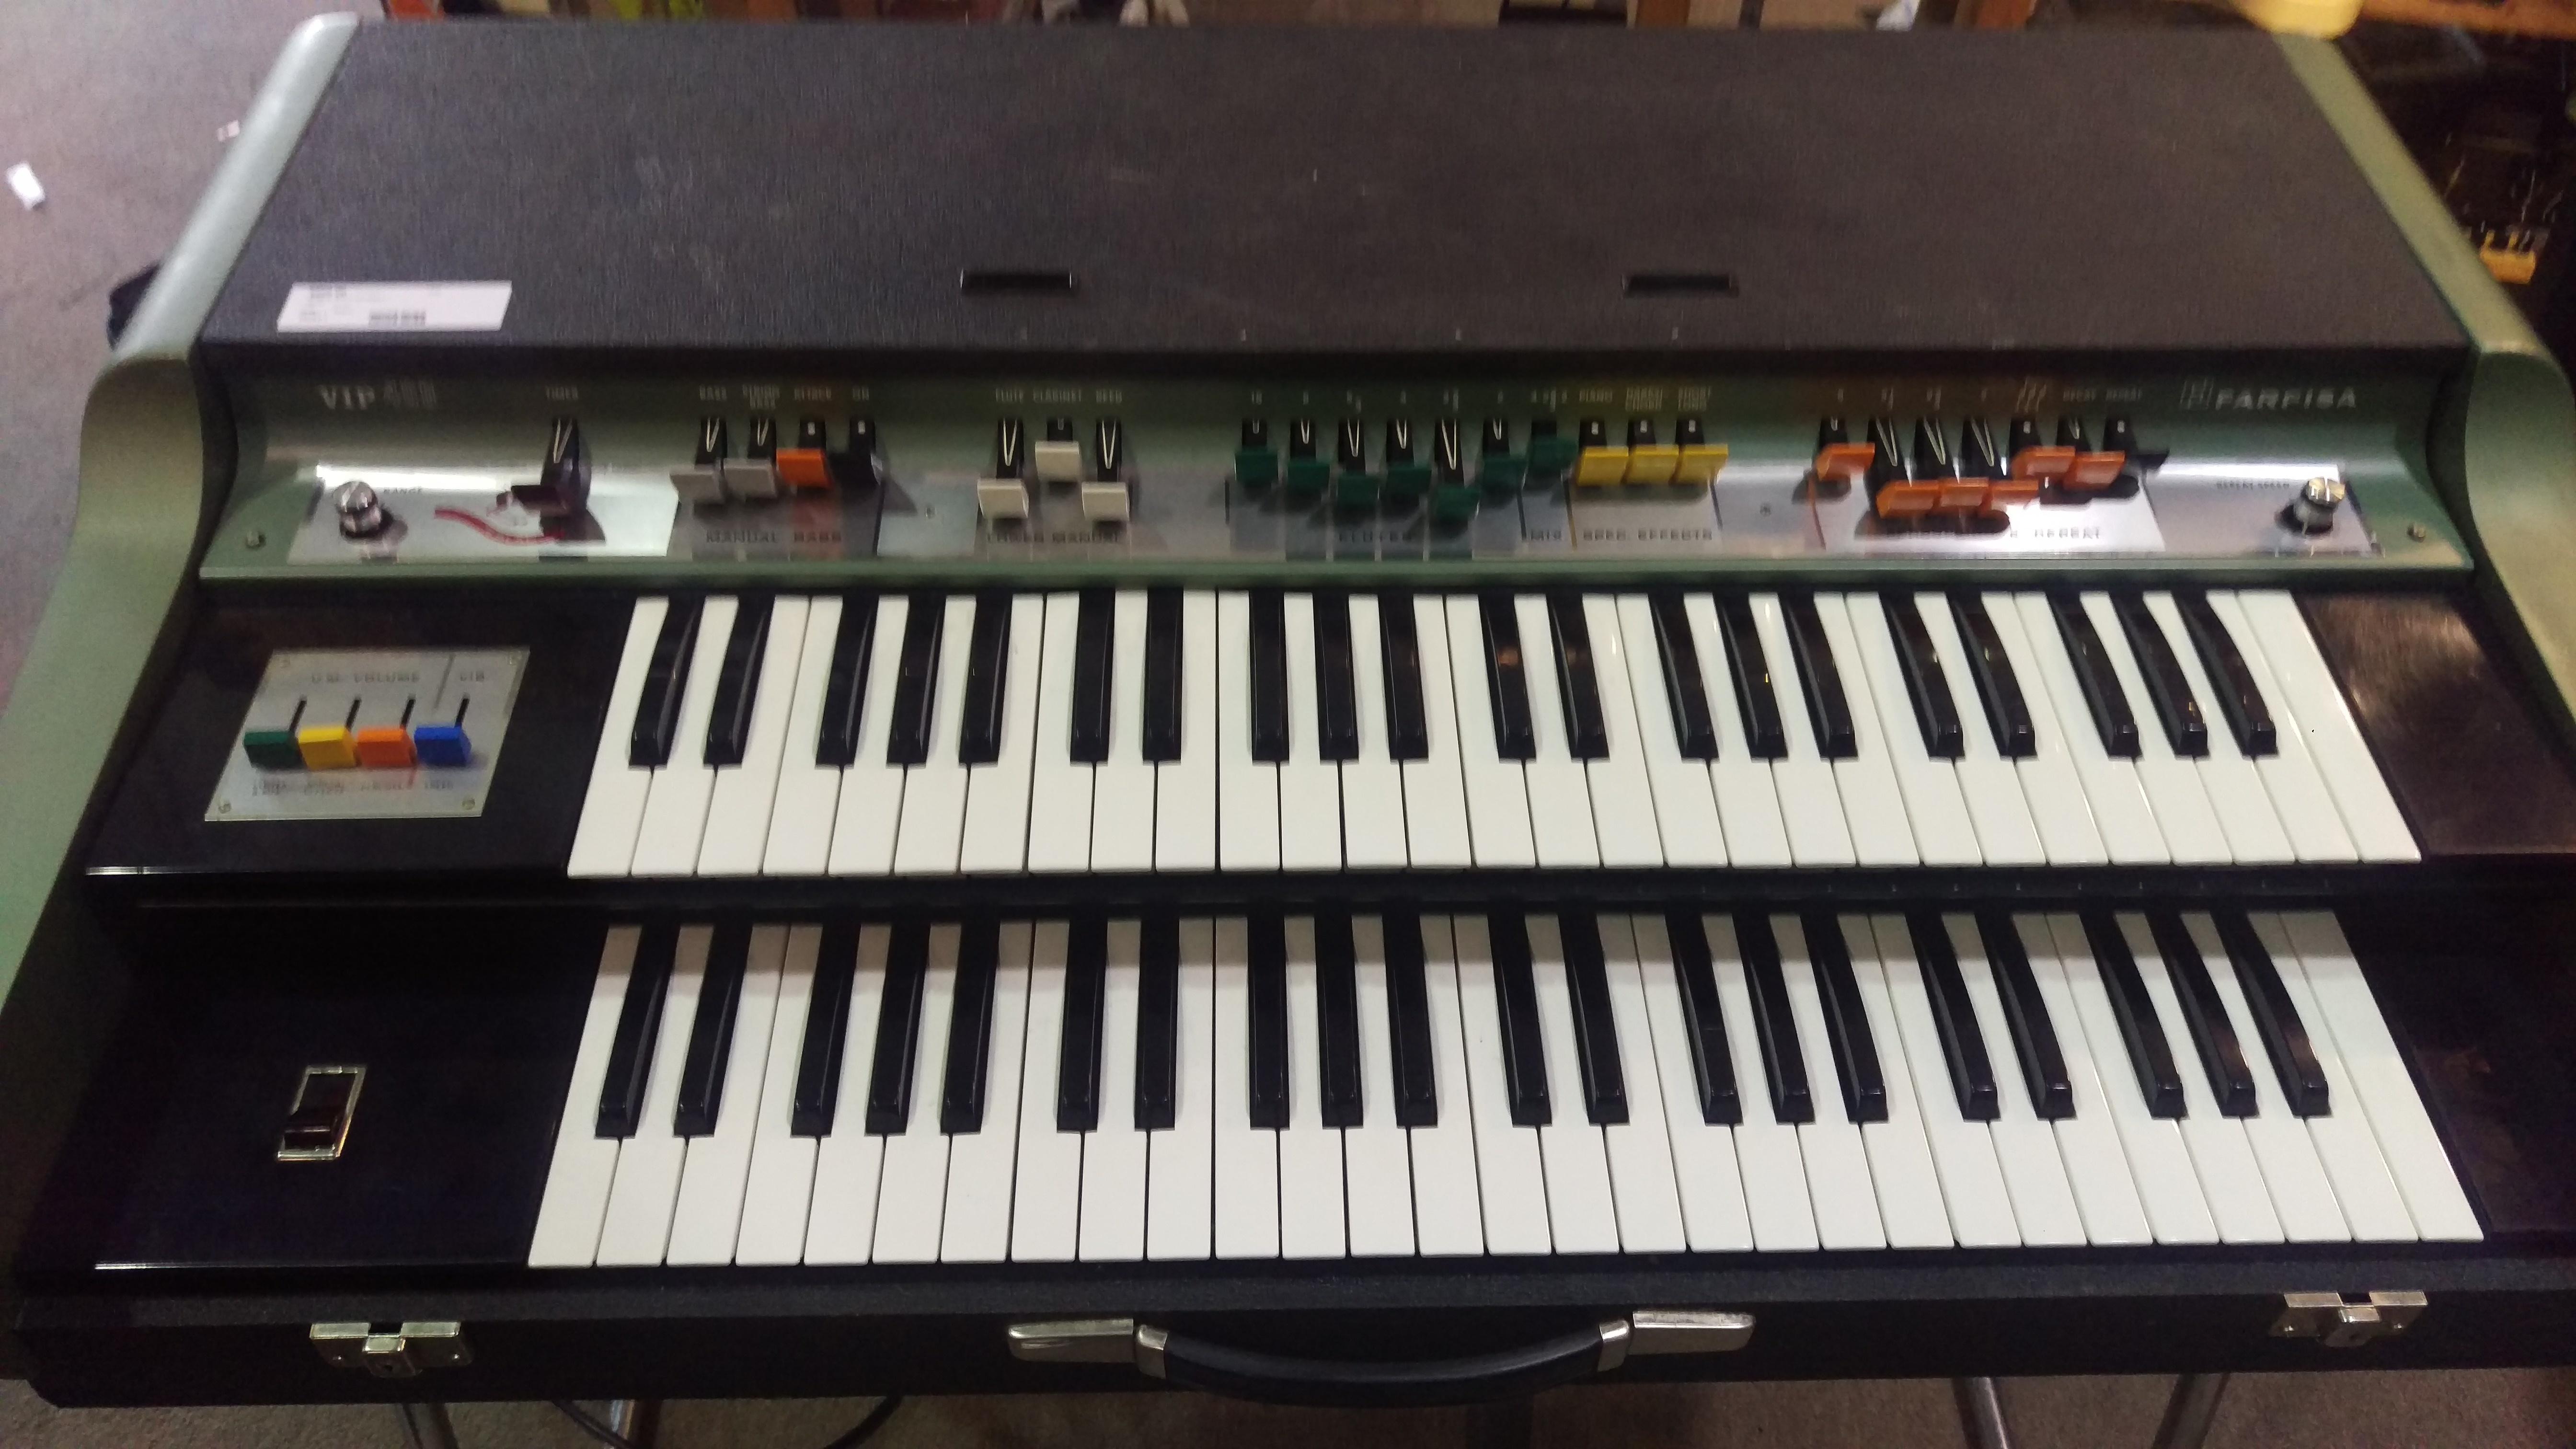 Farfisa VIP400 Keyboard W/ Stand